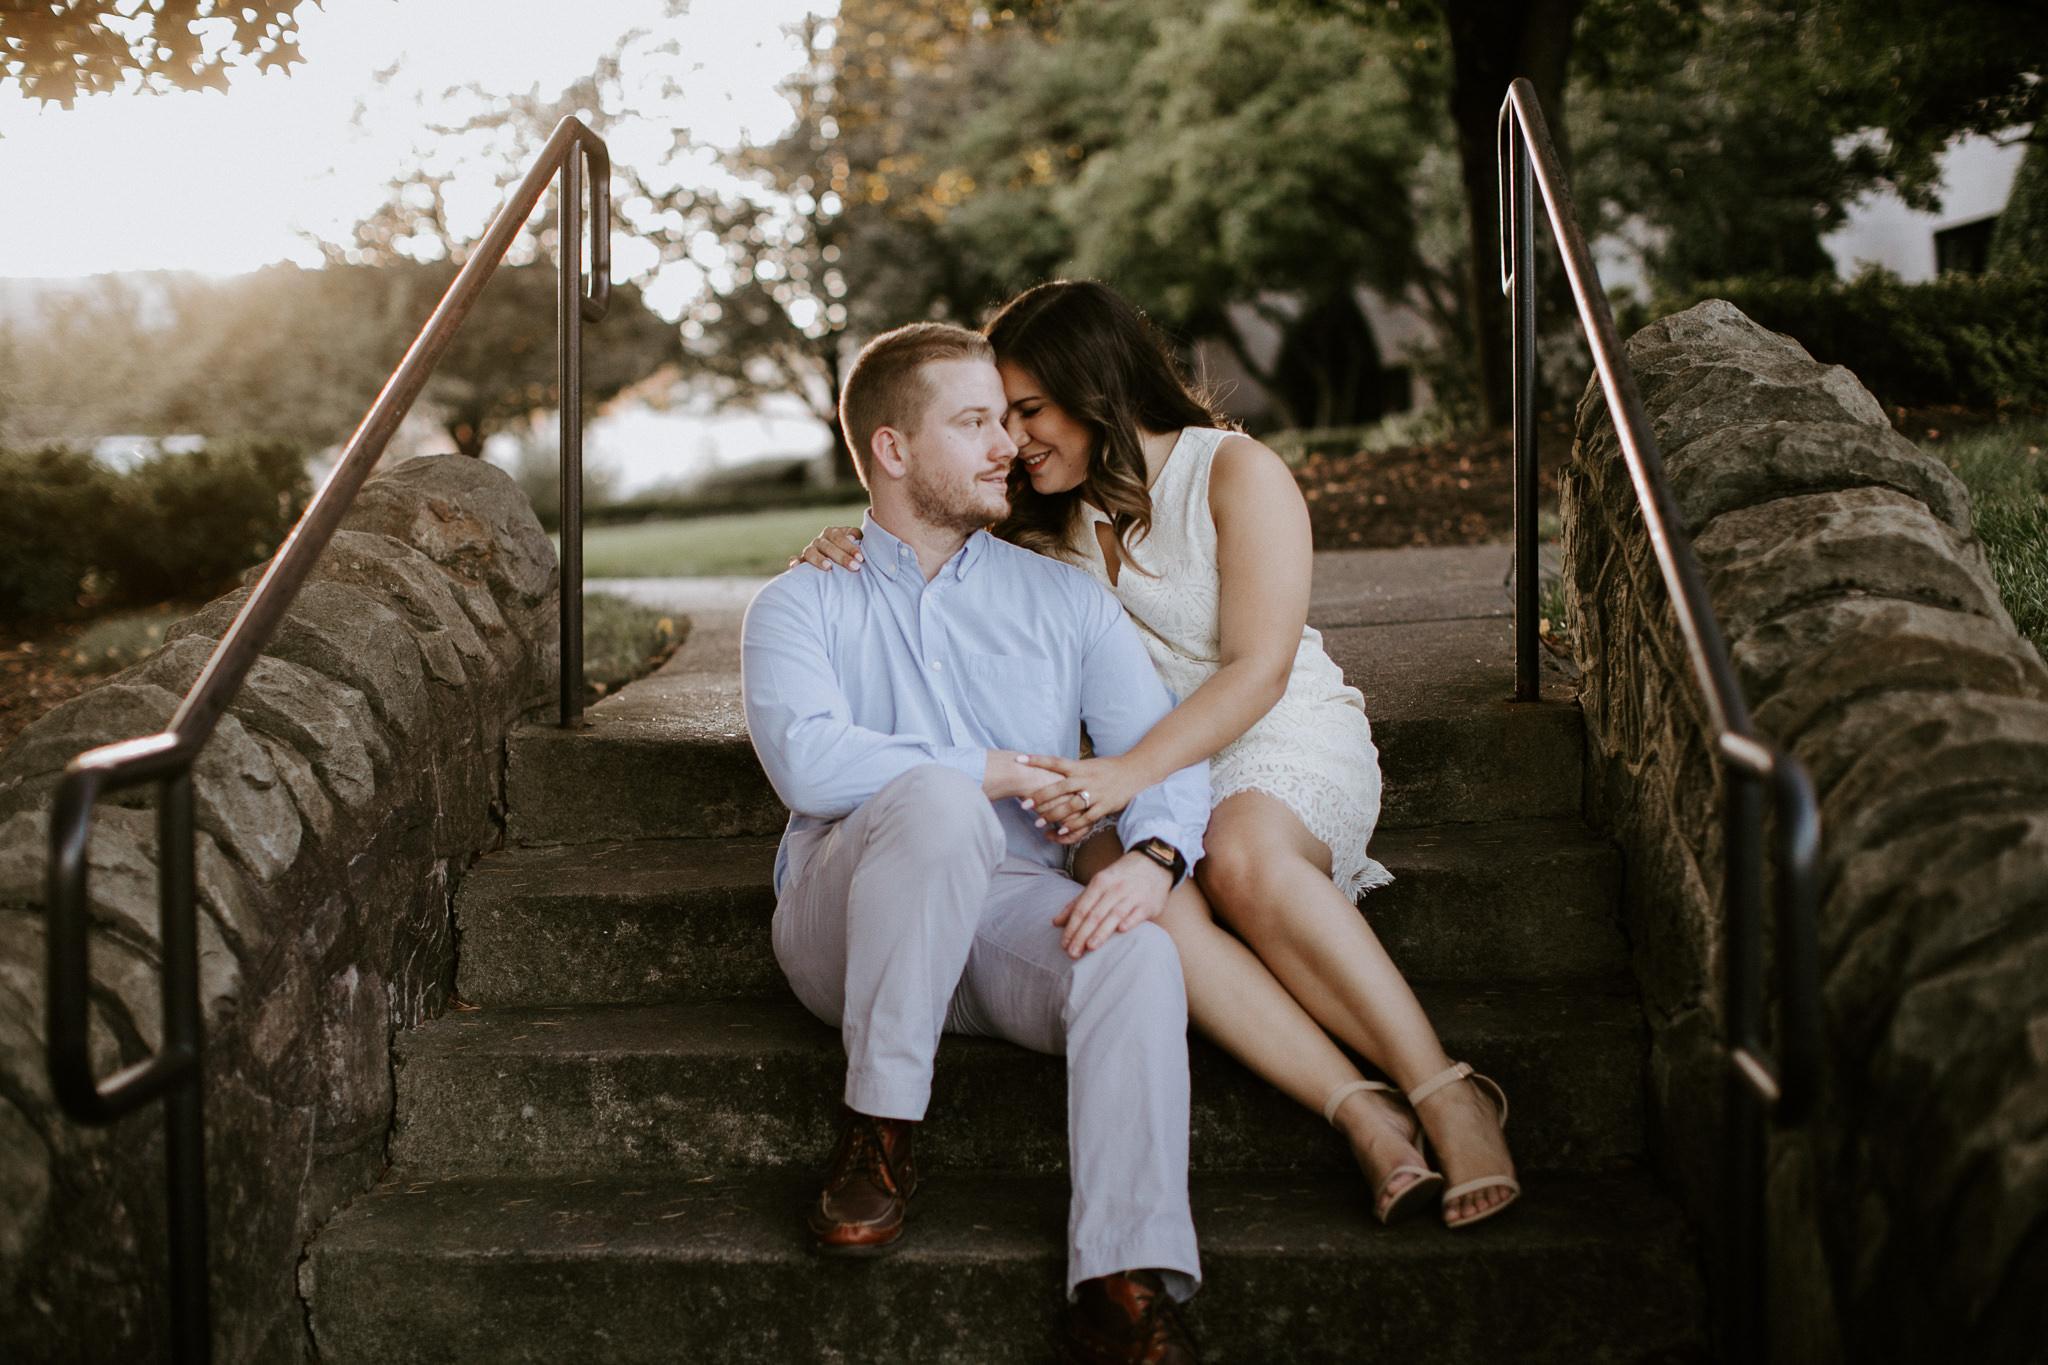 Engagement - Downtown Roanoke -  Wedding Photographer - Virginia - Best - Pat Cori Photography-16.jpg